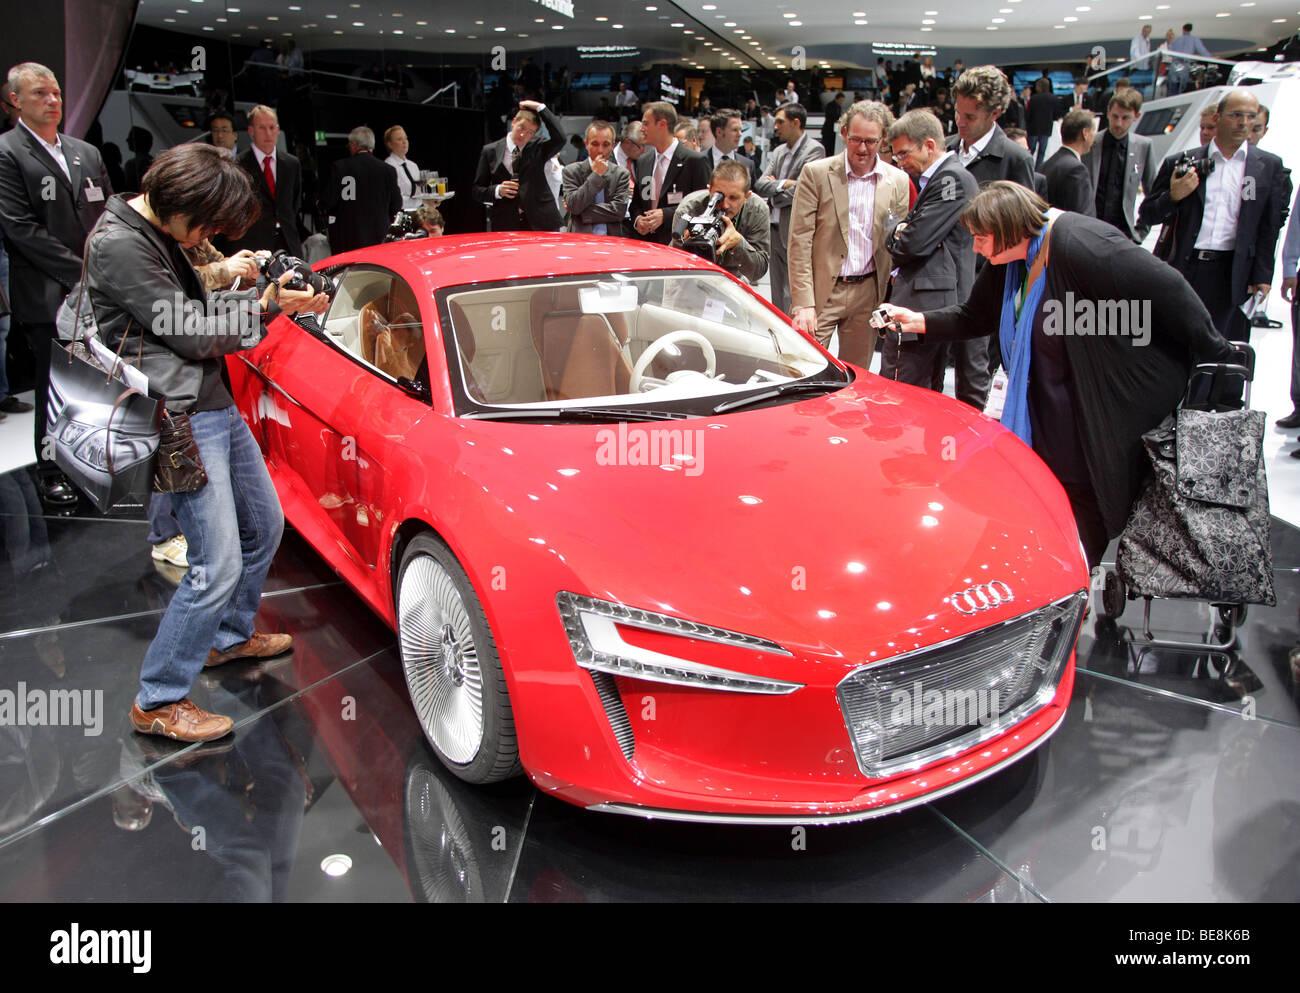 electric car 'Audi e-tron' at the 63. IAA Motor Show in Frankfurt/Germany, 15.9.2009 - Stock Image